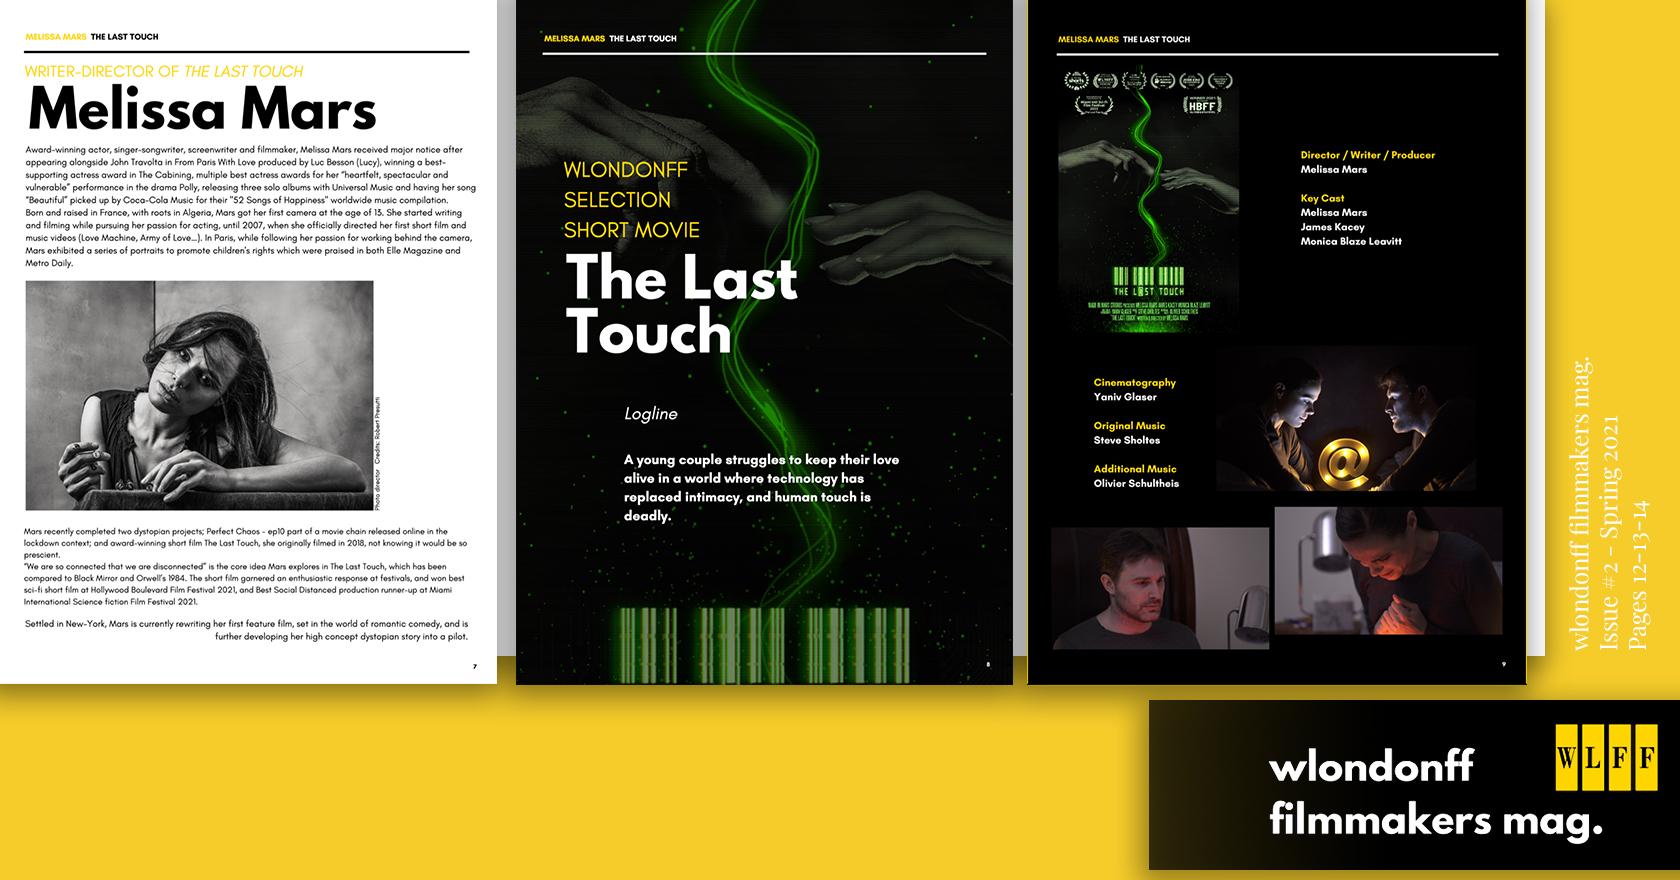 Featured in WLONDONFF Filmmakers Magazine!